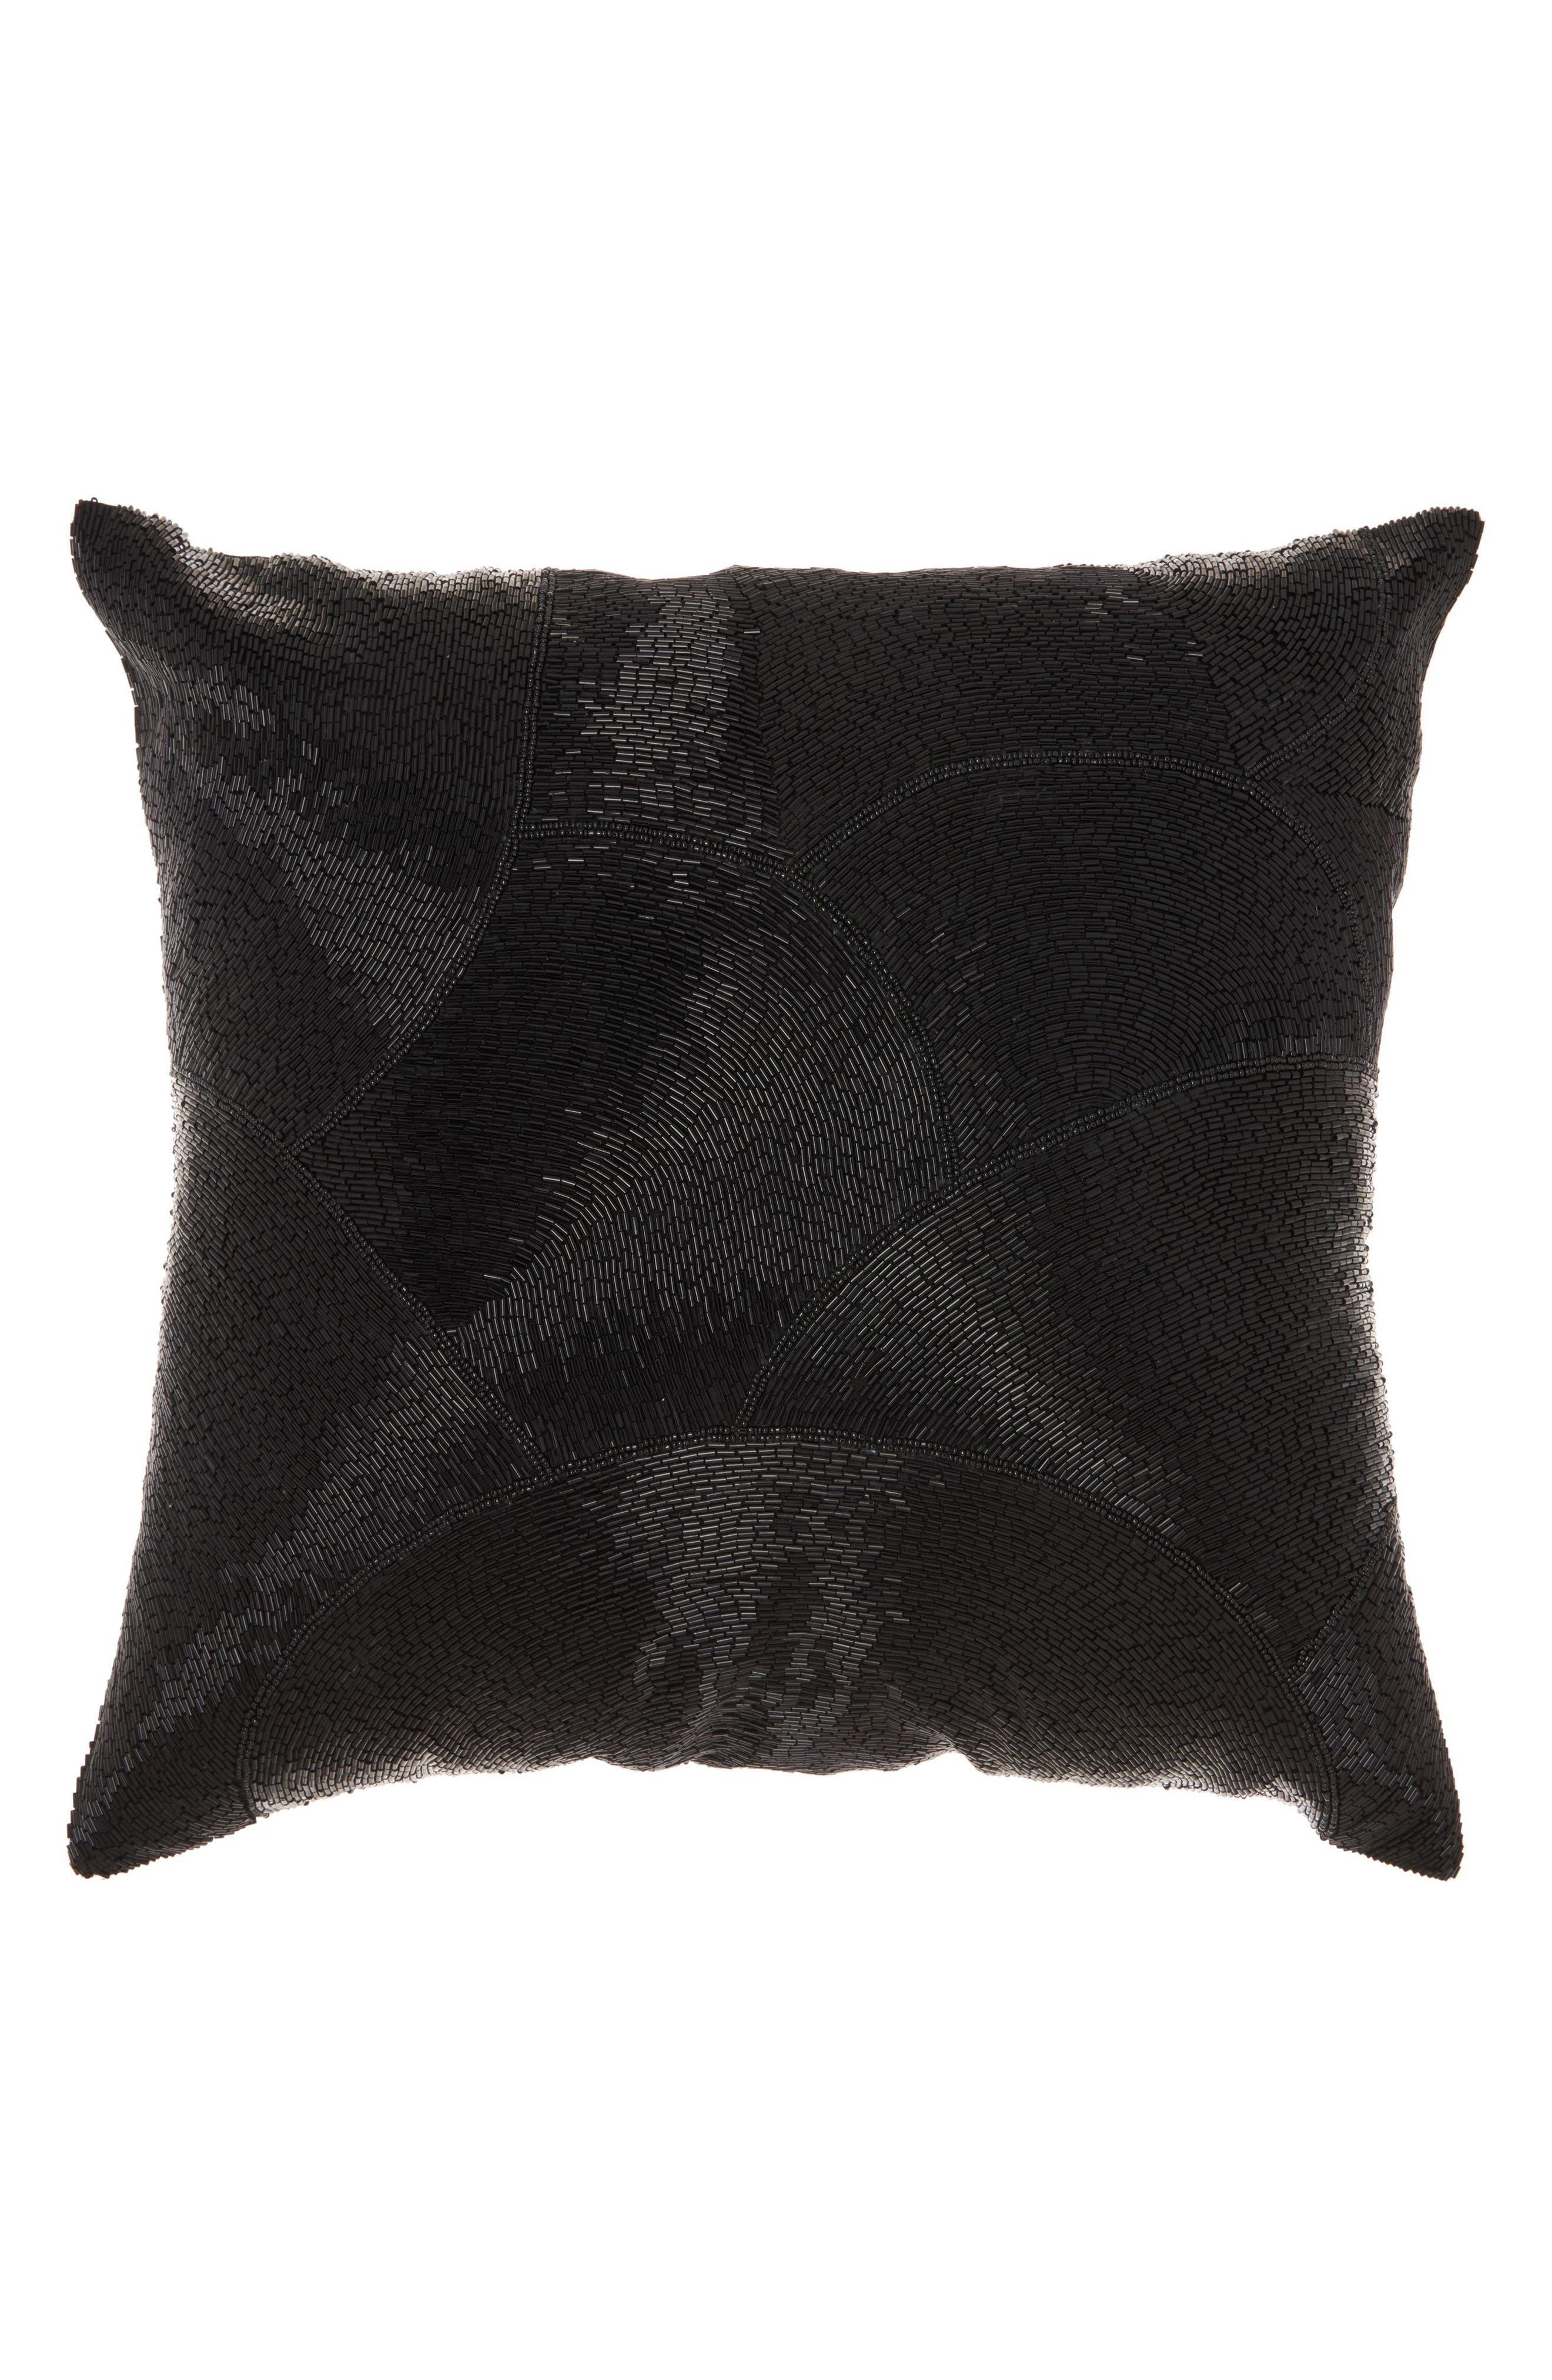 Beaded Fan Pillow,                         Main,                         color, 001